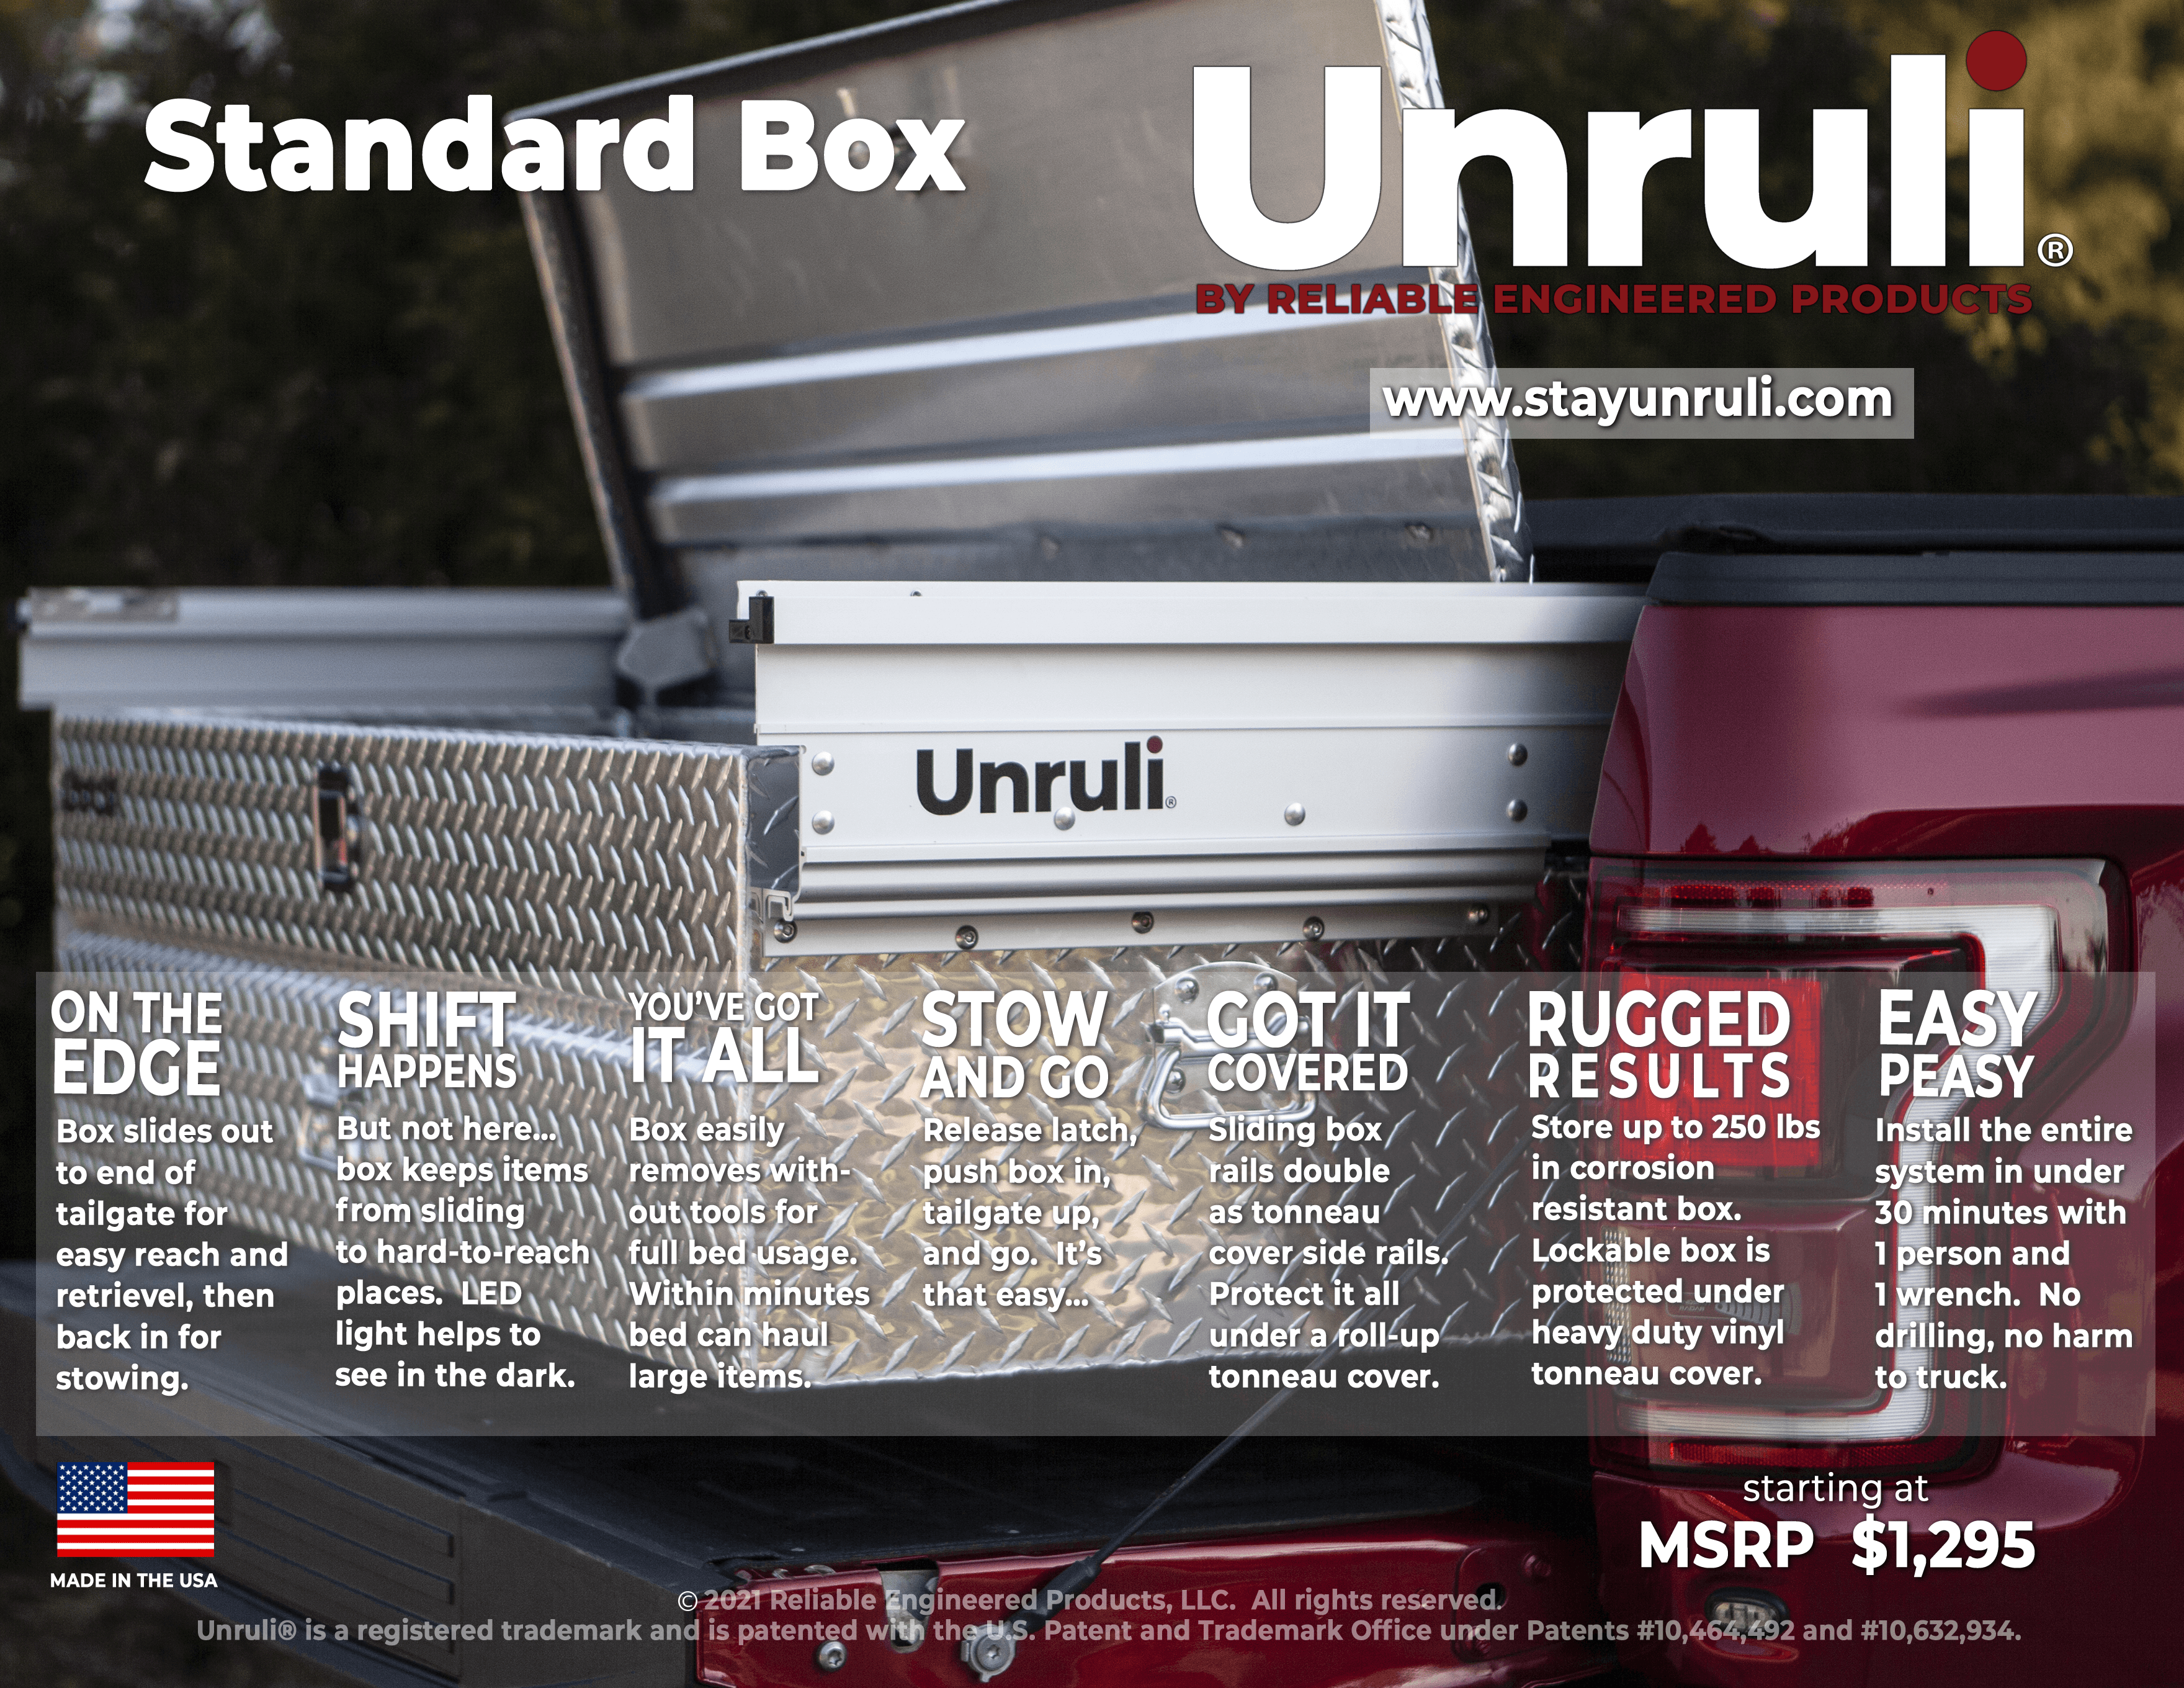 Unruli Standard Box features